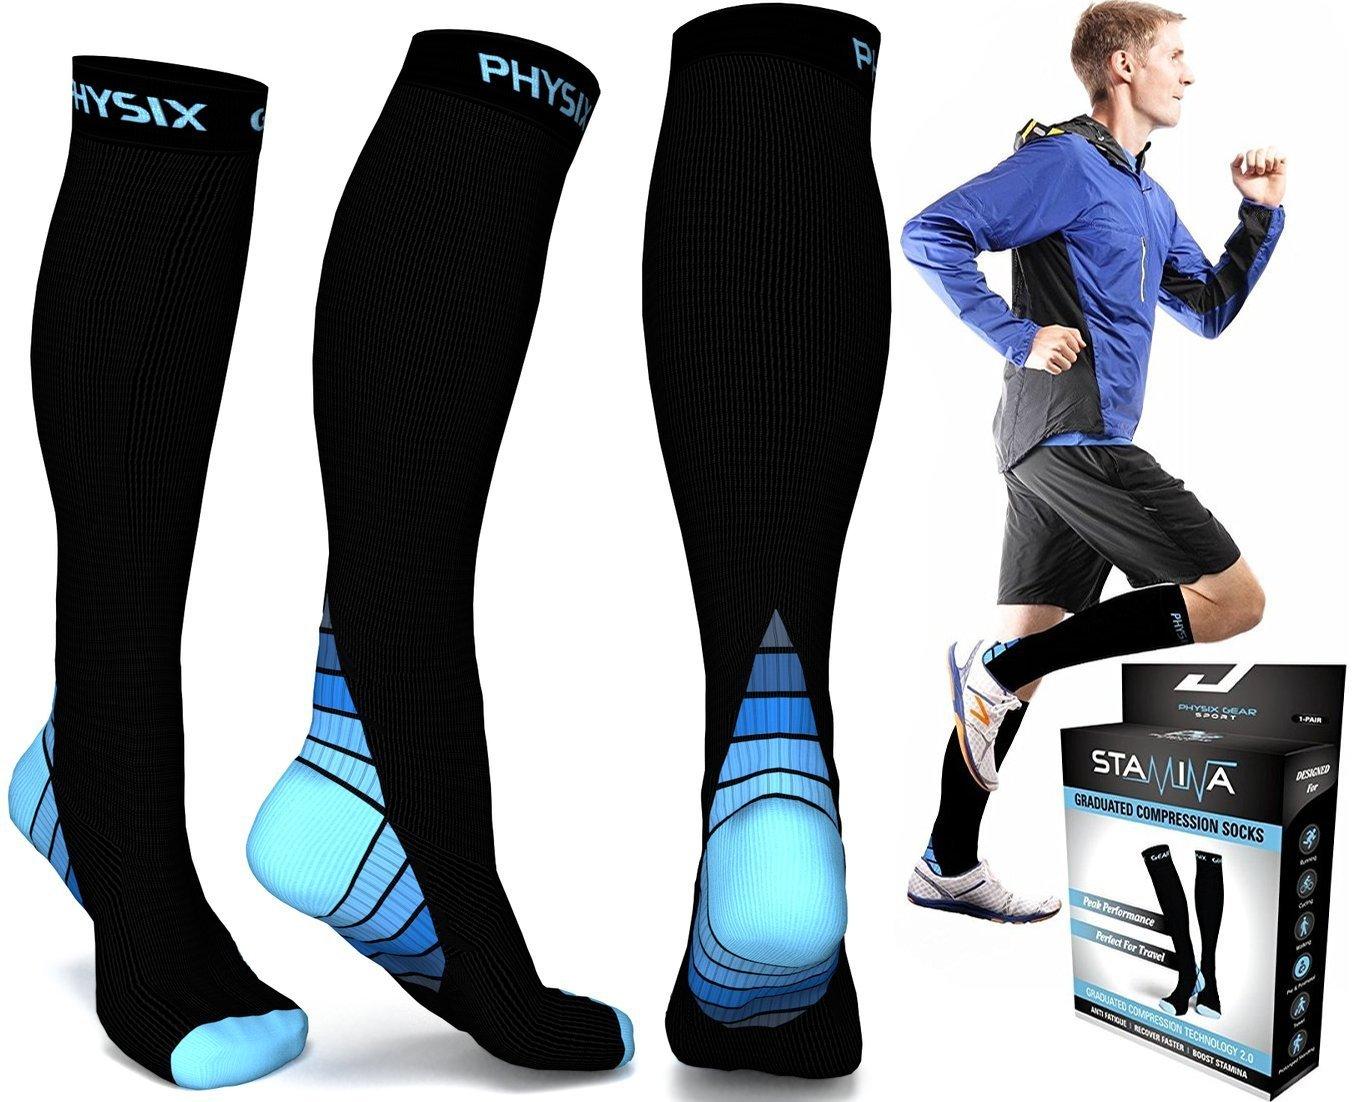 231908531590d Buy Physix Gear Compression Socks for Men & Women (20 - 30 mmhg ...